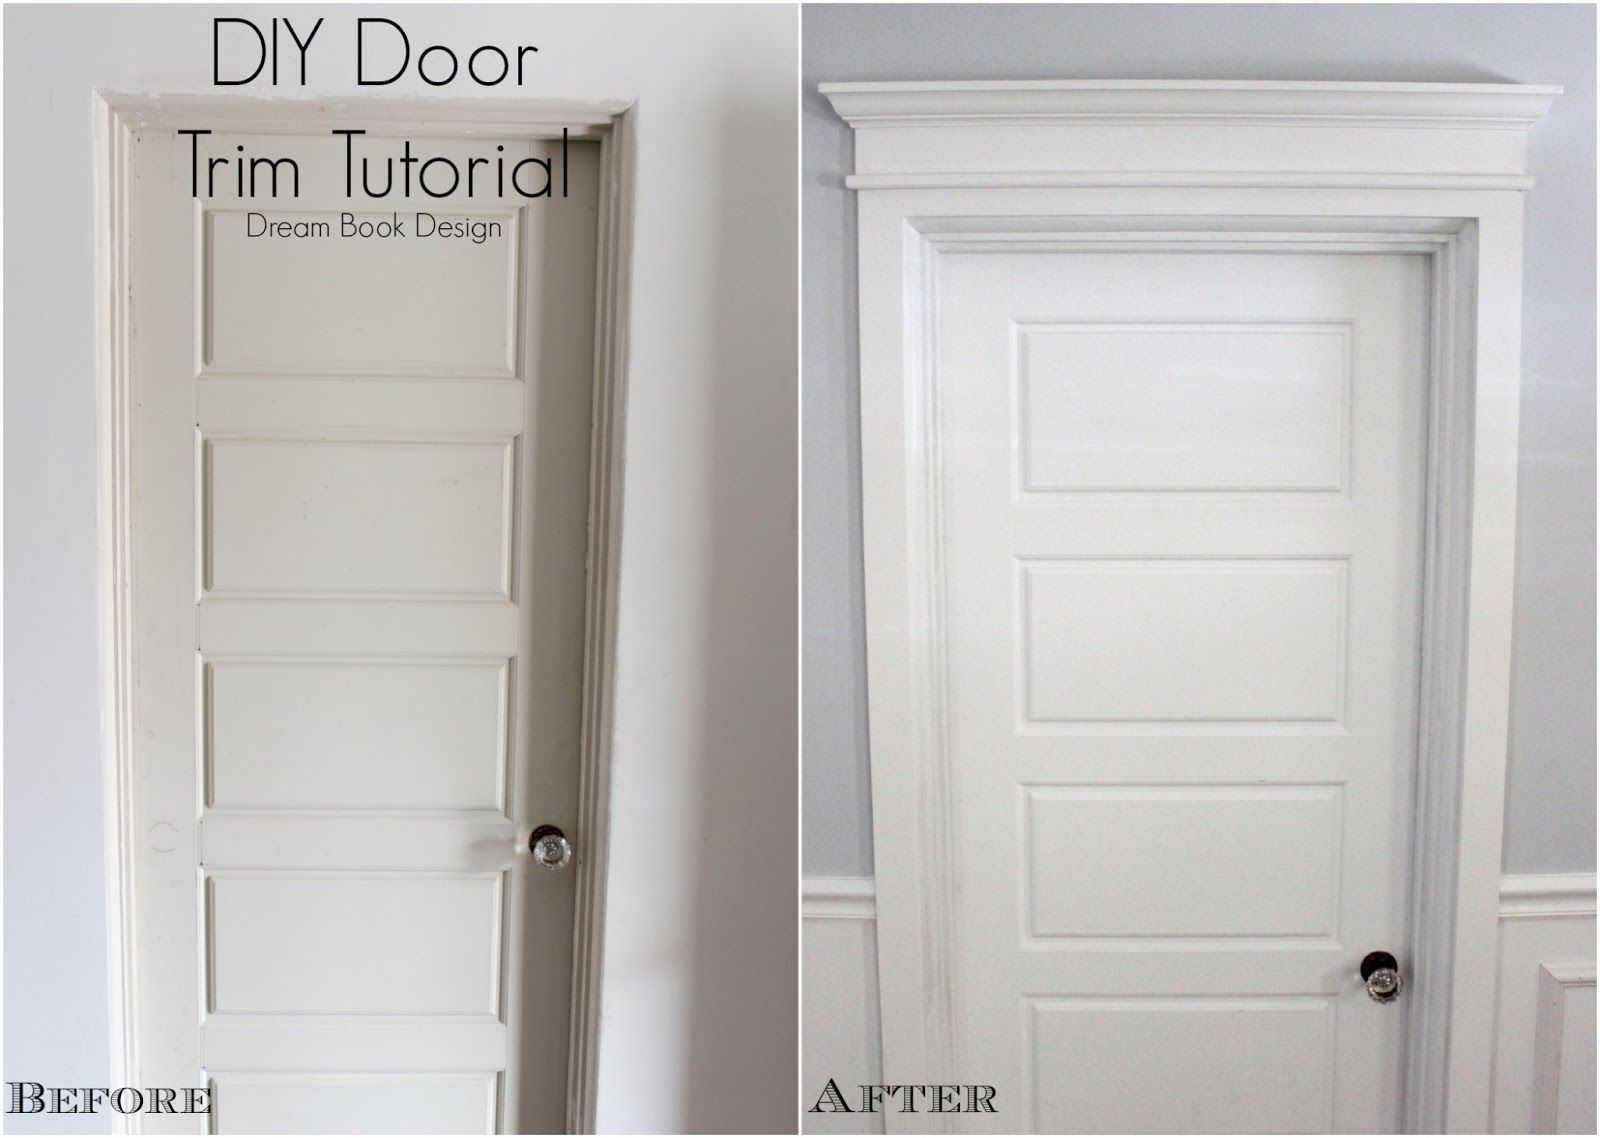 DIY Door Trim Tutorial | Türrahmen, Türen und Deckenleisten